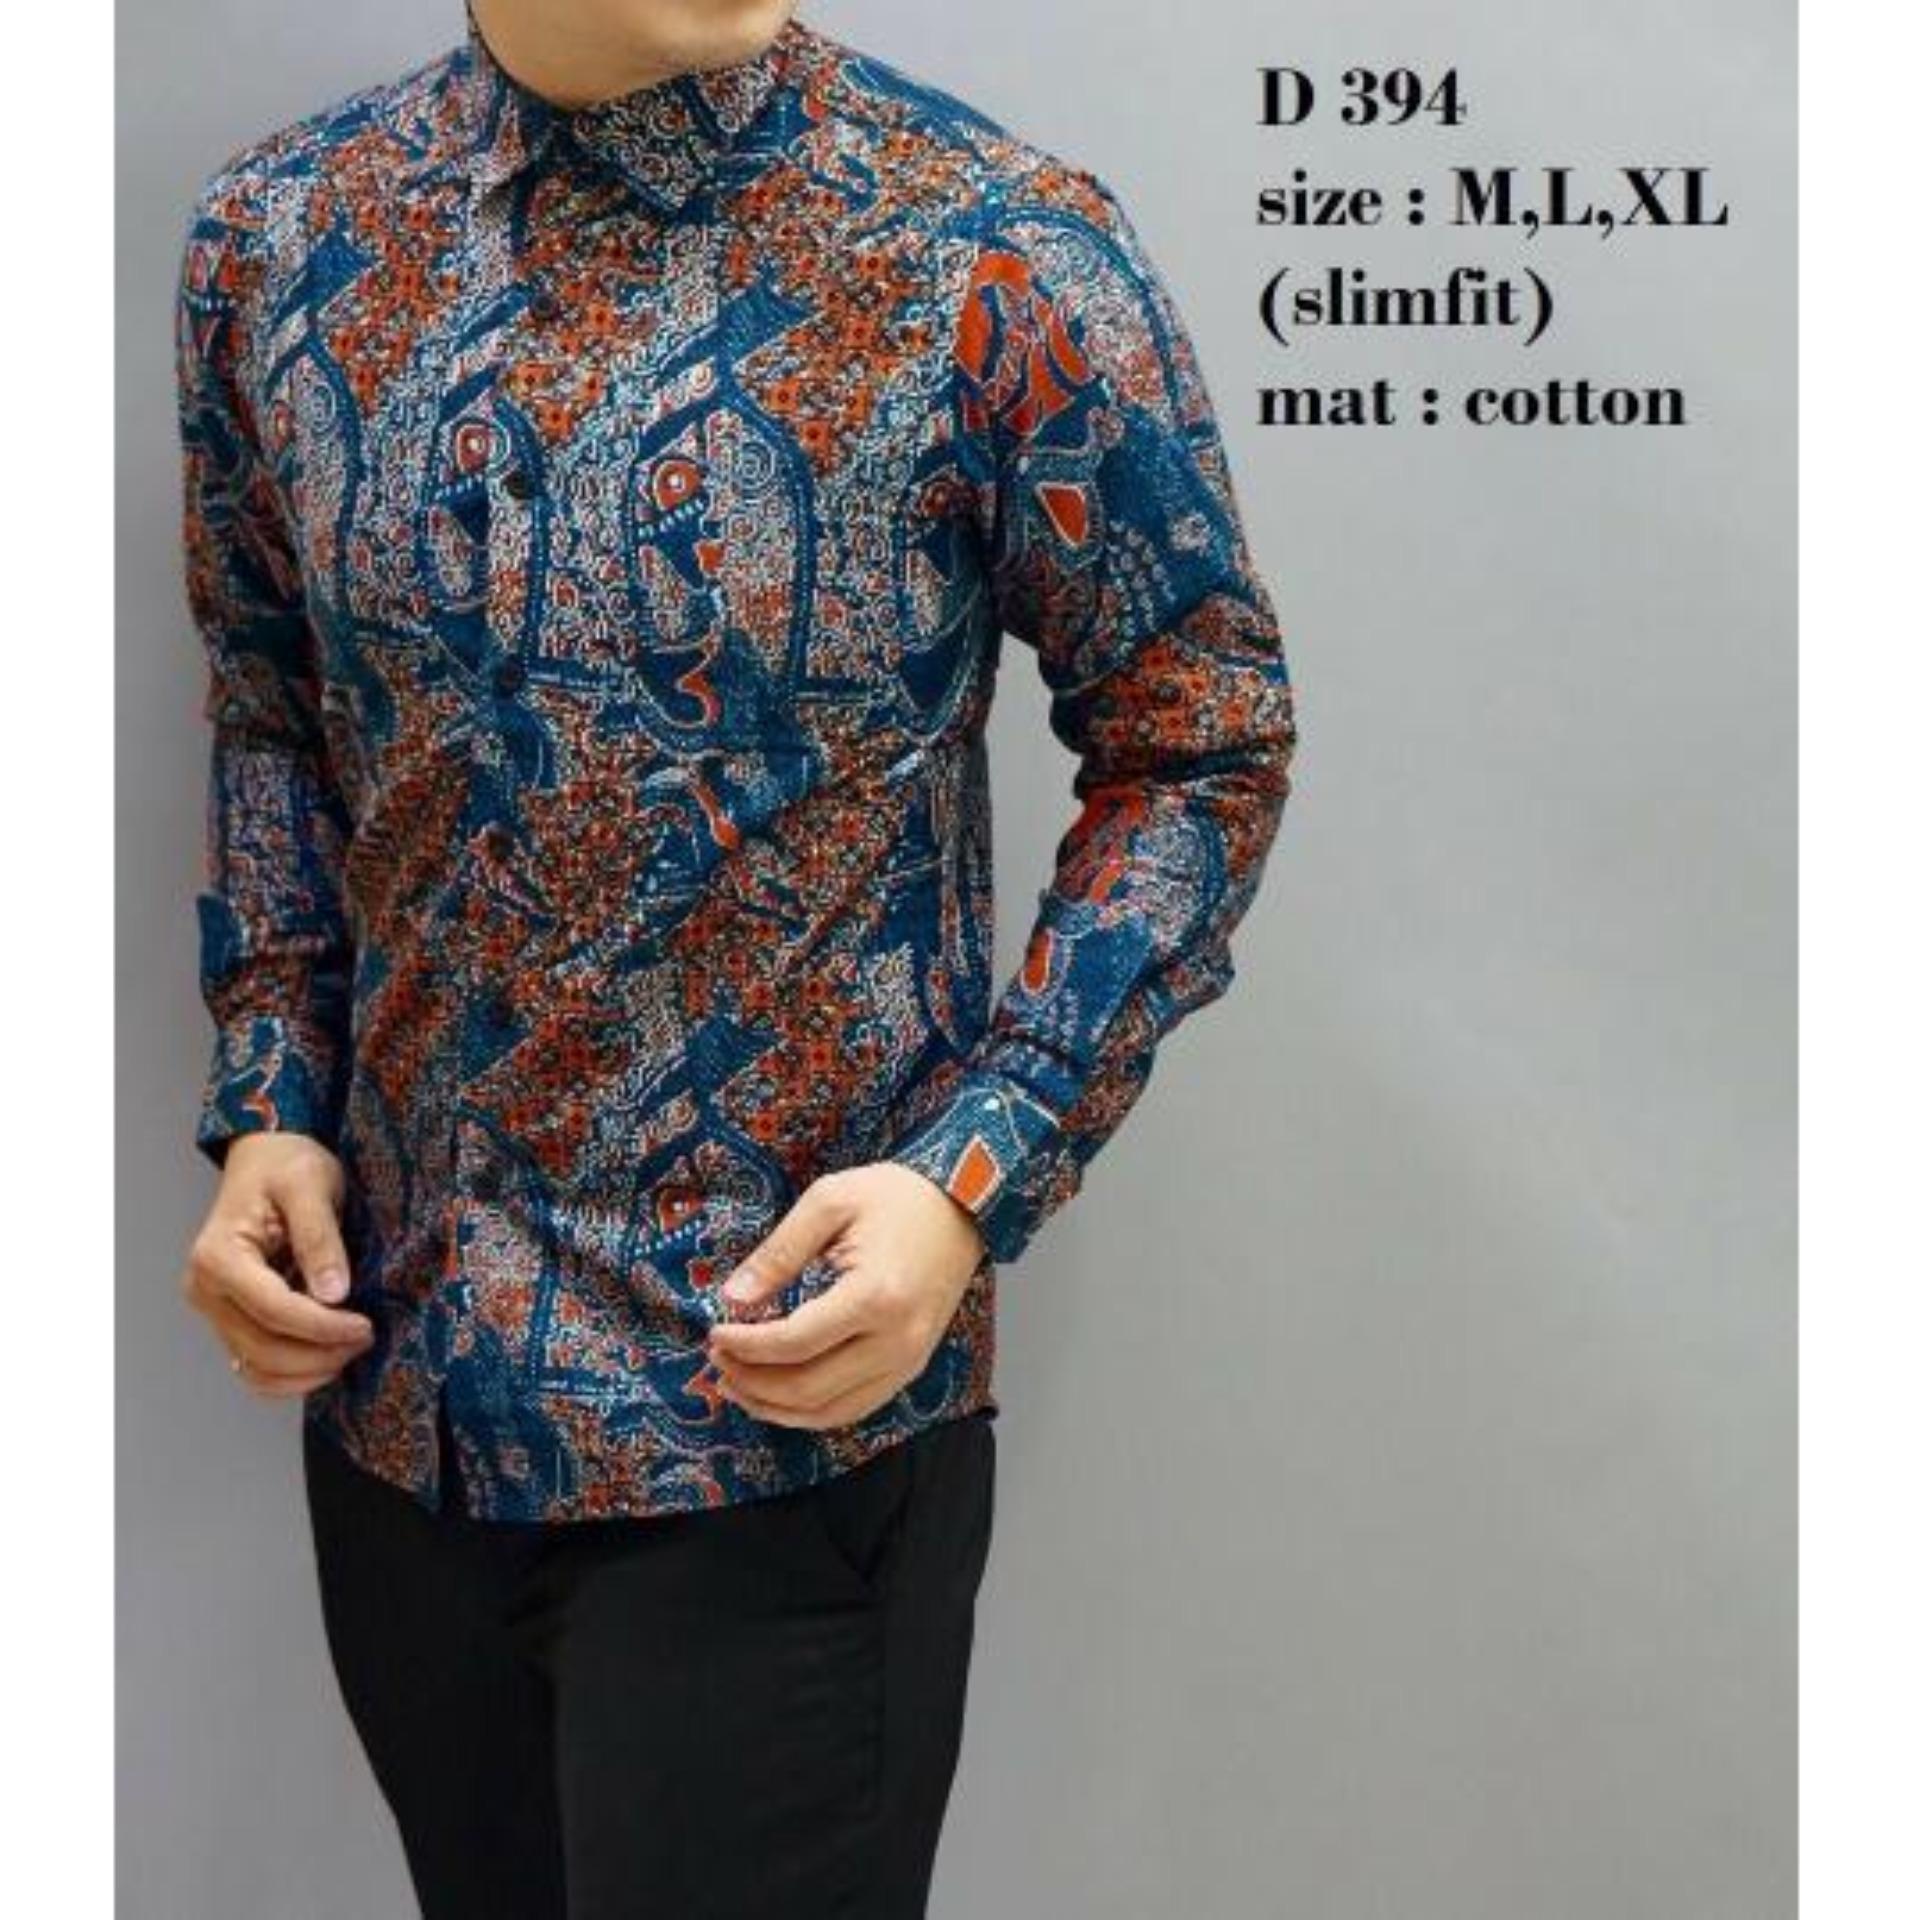 Baju Kemeja Batik Slimfit D394 - Original ODZA - Fashion Pria - Hem Cowok